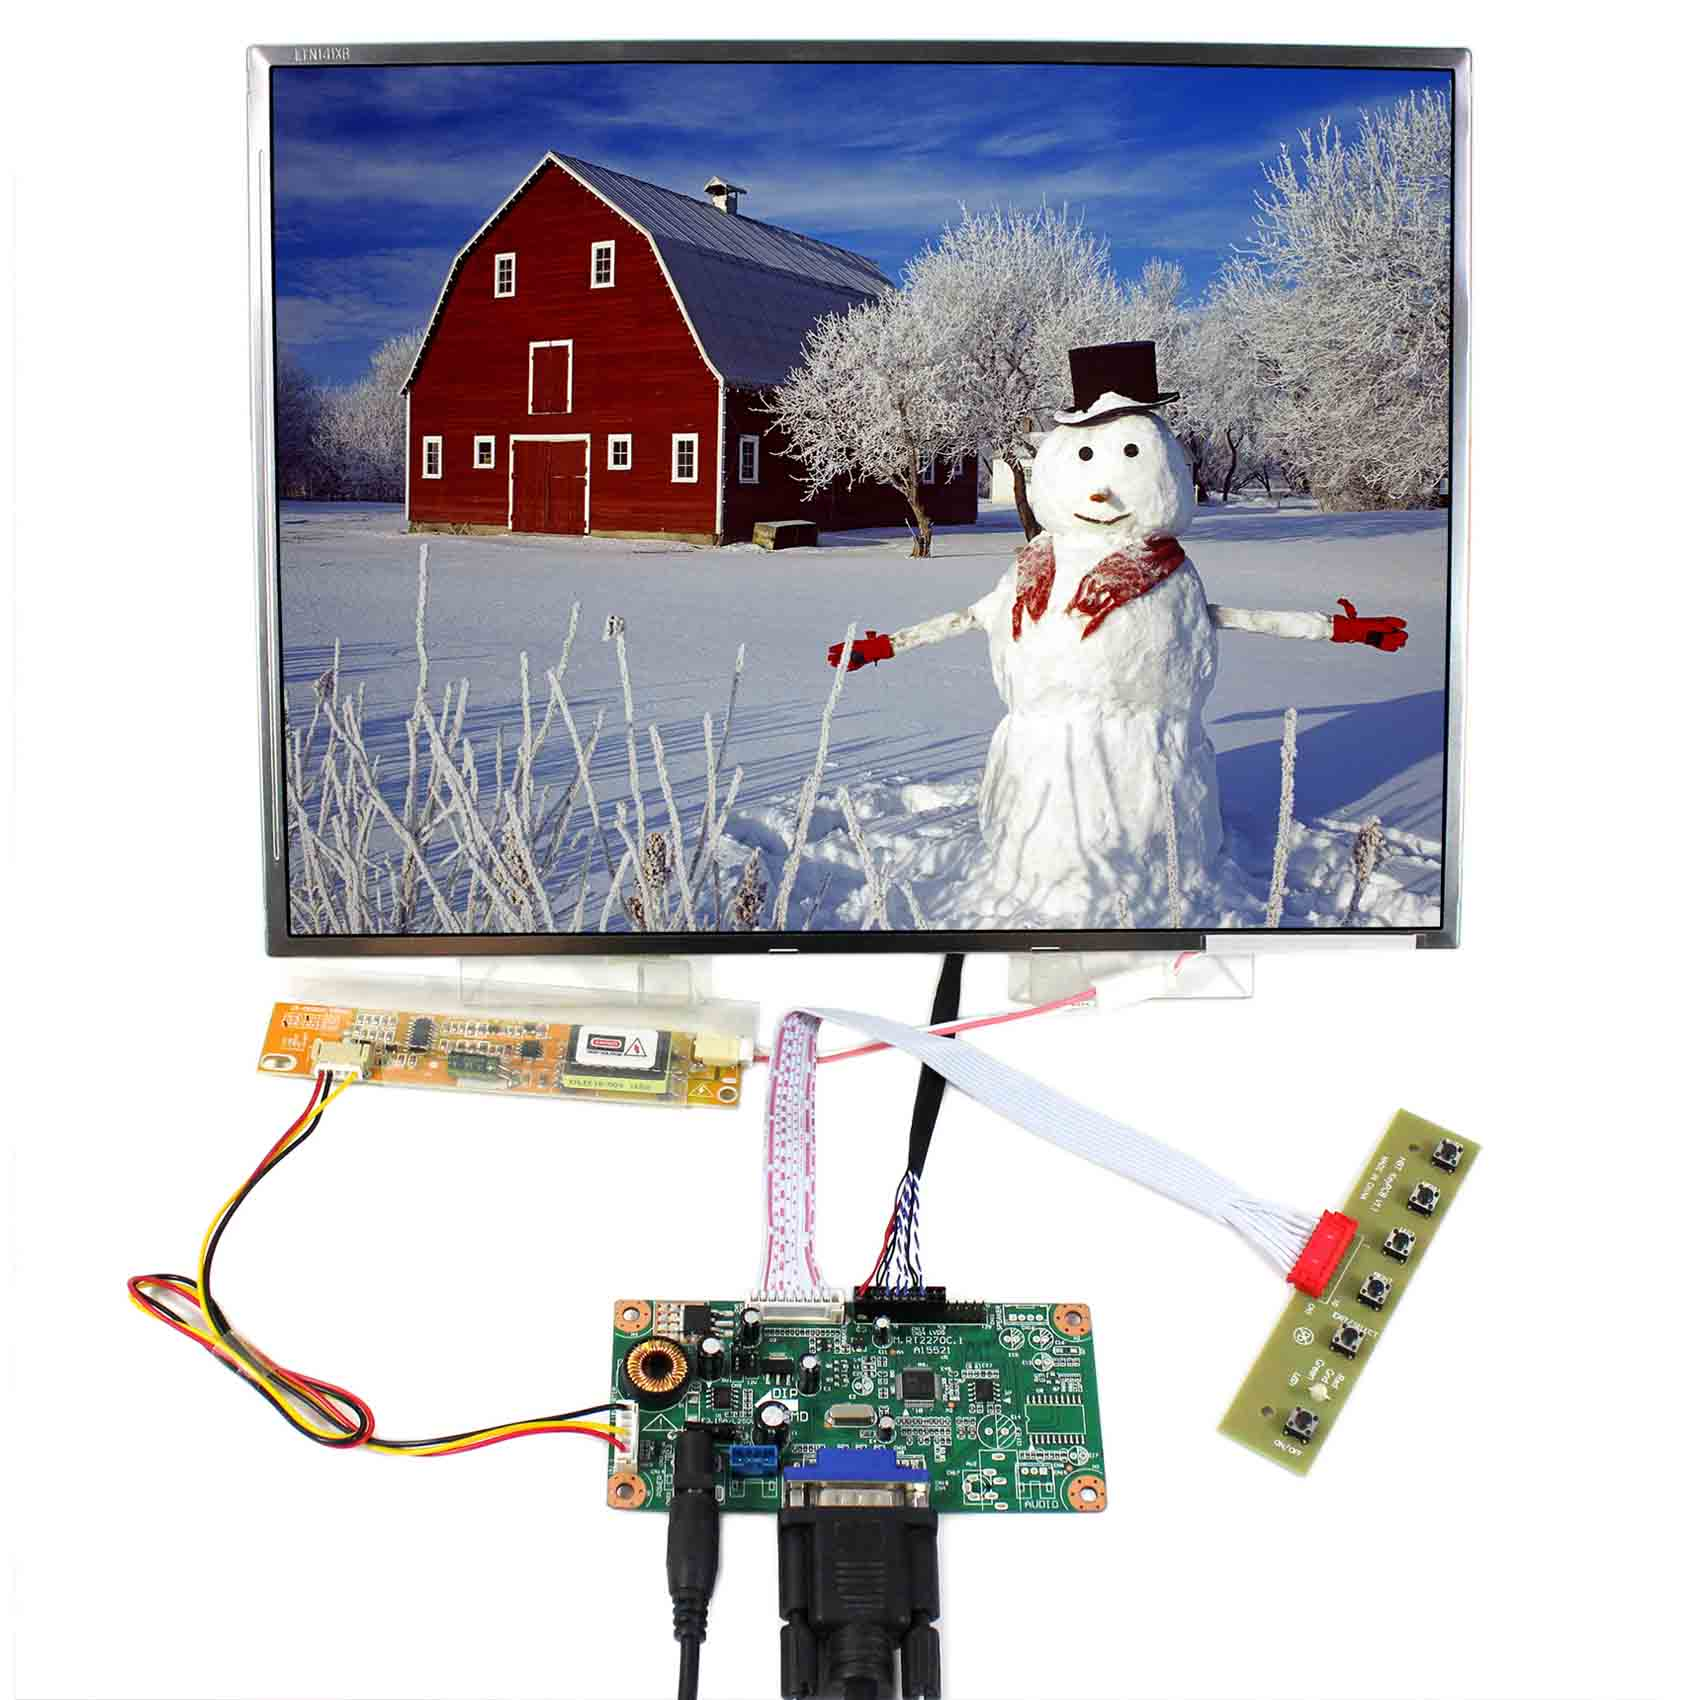 VGA LCD Controller Board 14inch 1024x768 N141X6 LTN141XF  LTN141X6 LP141X10   LCD ScreenVGA LCD Controller Board 14inch 1024x768 N141X6 LTN141XF  LTN141X6 LP141X10   LCD Screen